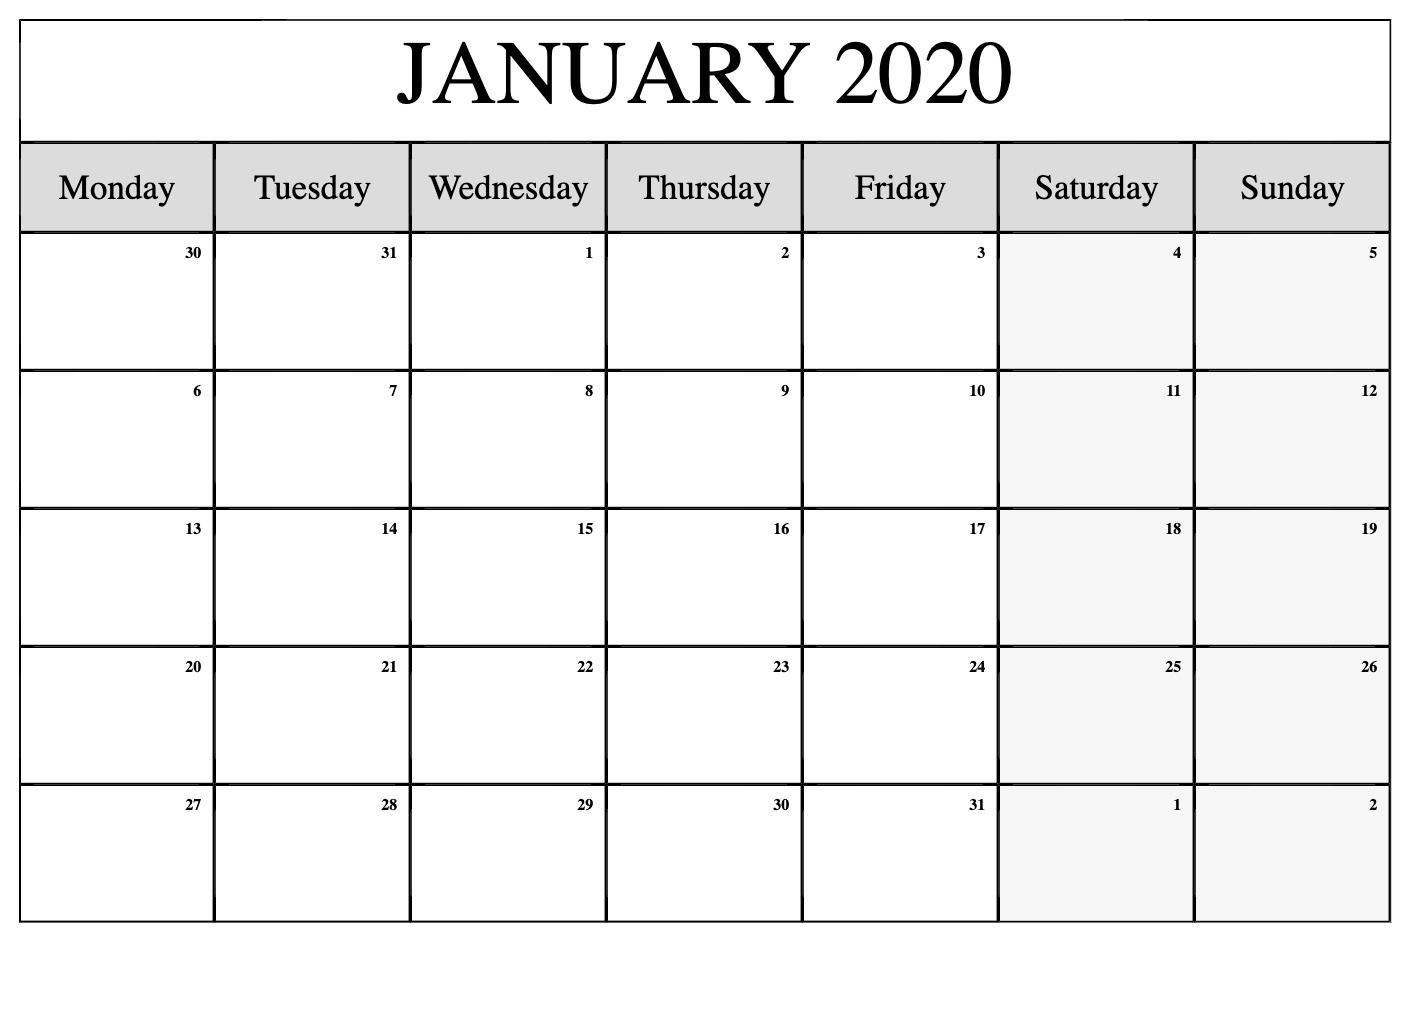 Top Blank January 2020 Holiday Print Free Calendar for Wincalendar January 2020